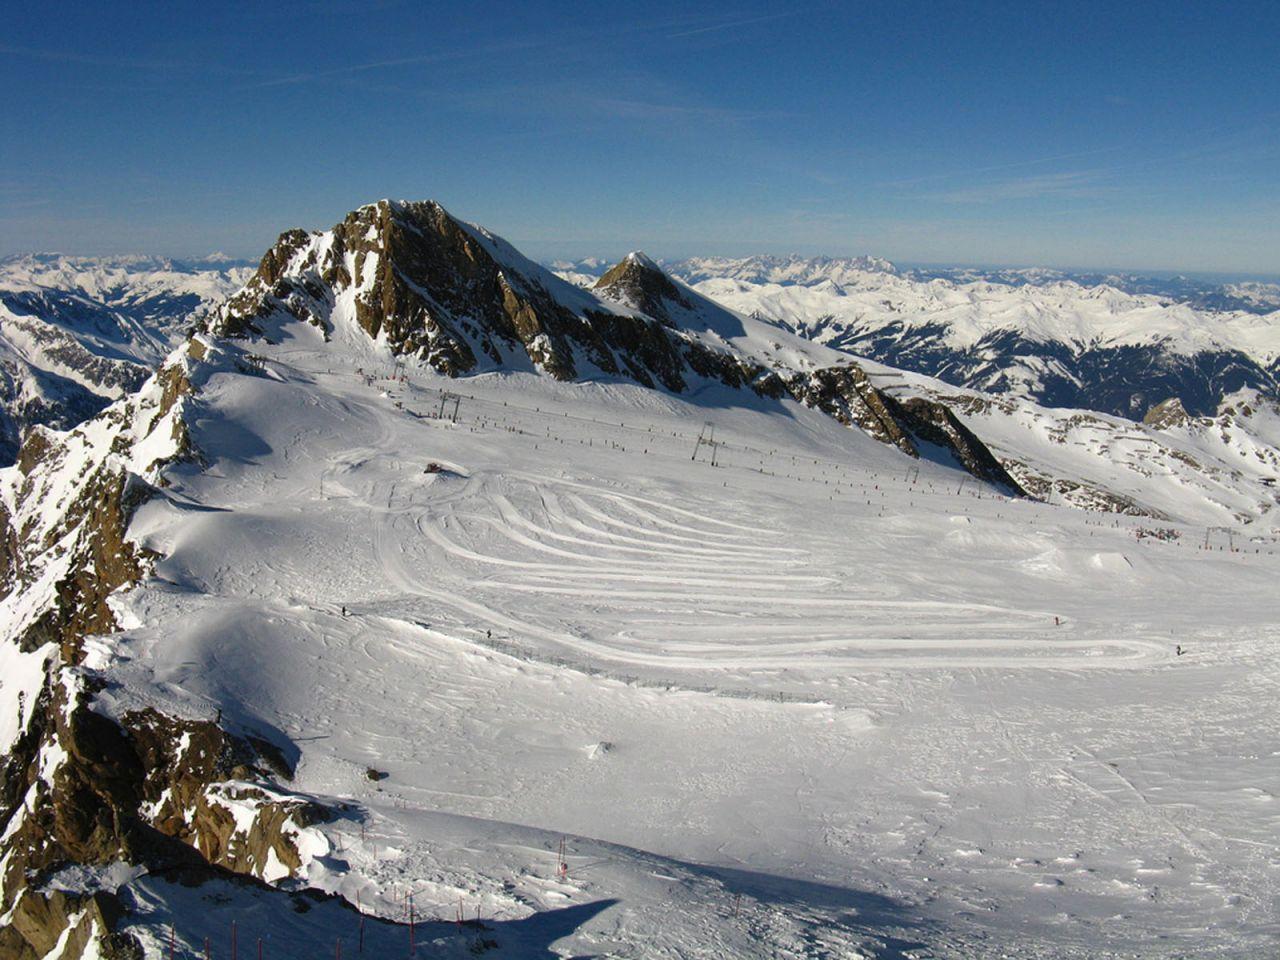 Alps Swiss Gstaad Winter Tavel HD Wallpaper